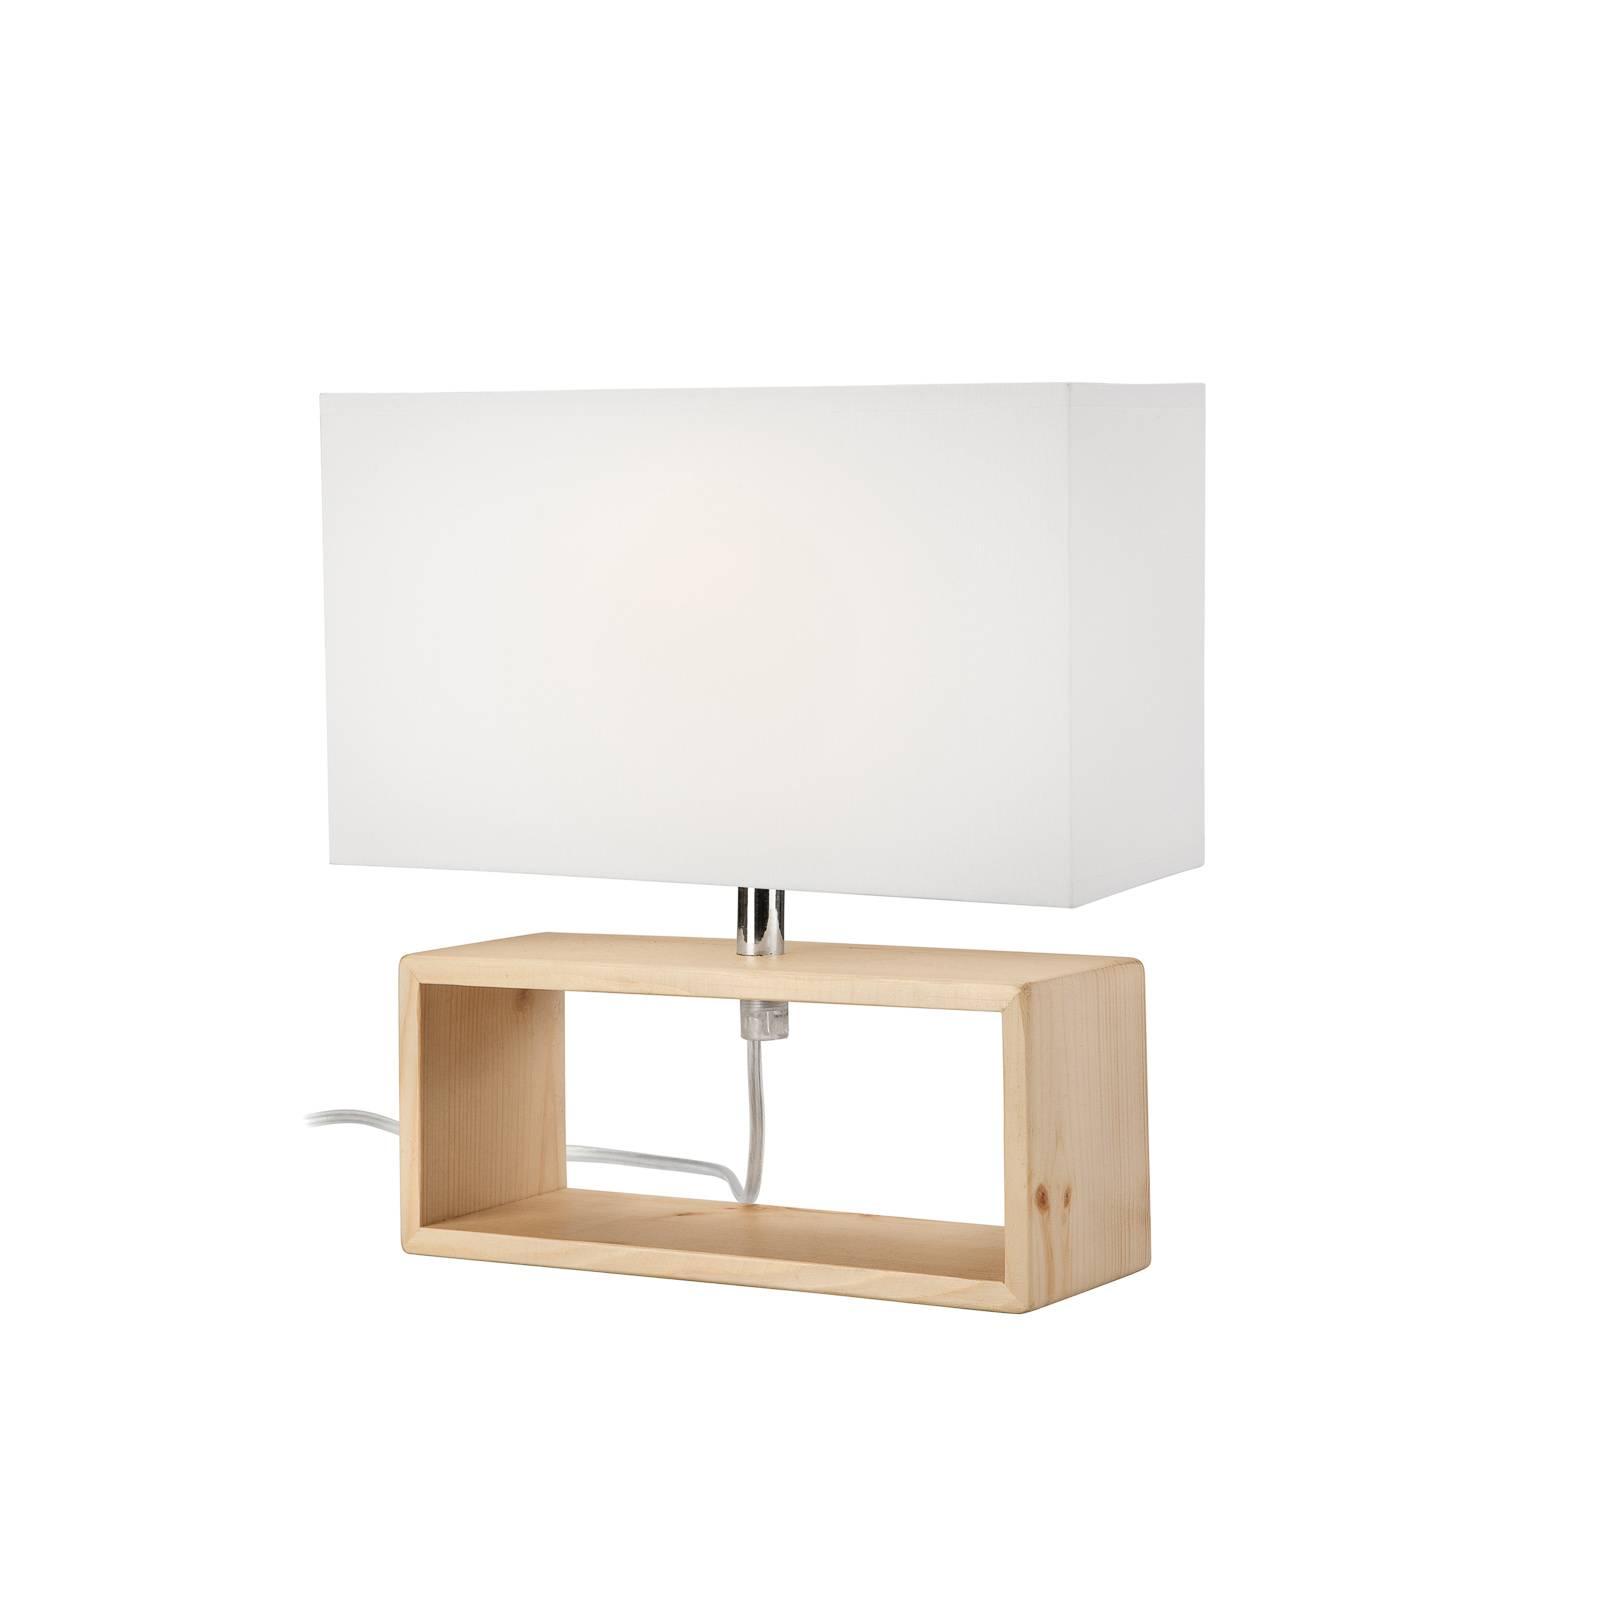 Lampe à poser Faxa, rectangulaire, naturel/blanc